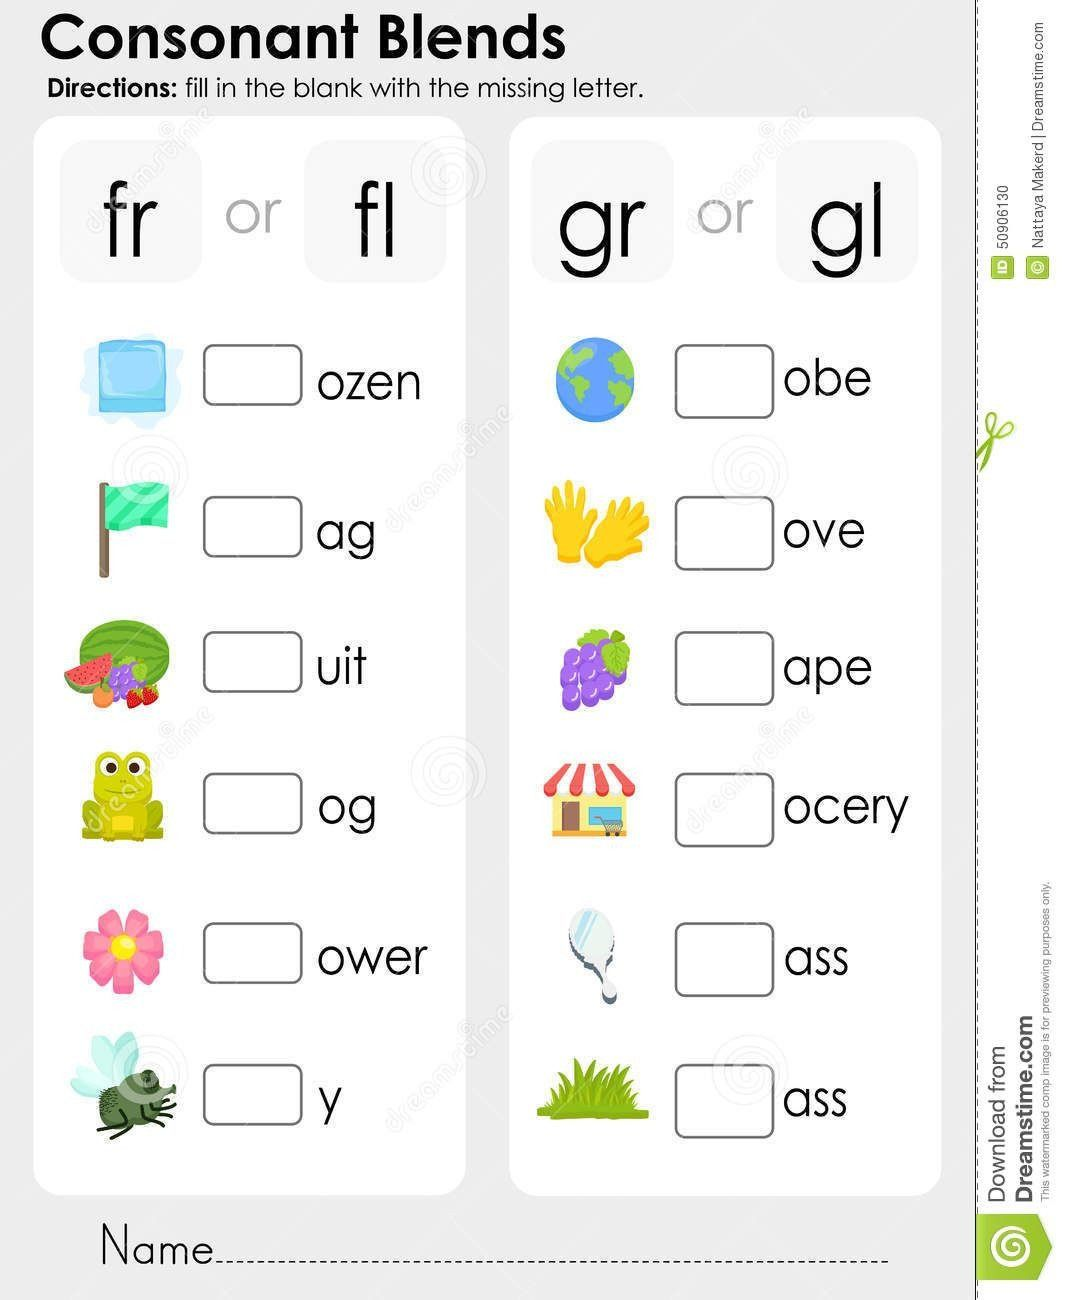 Free Printable R Blends Worksheets Consonant Blends